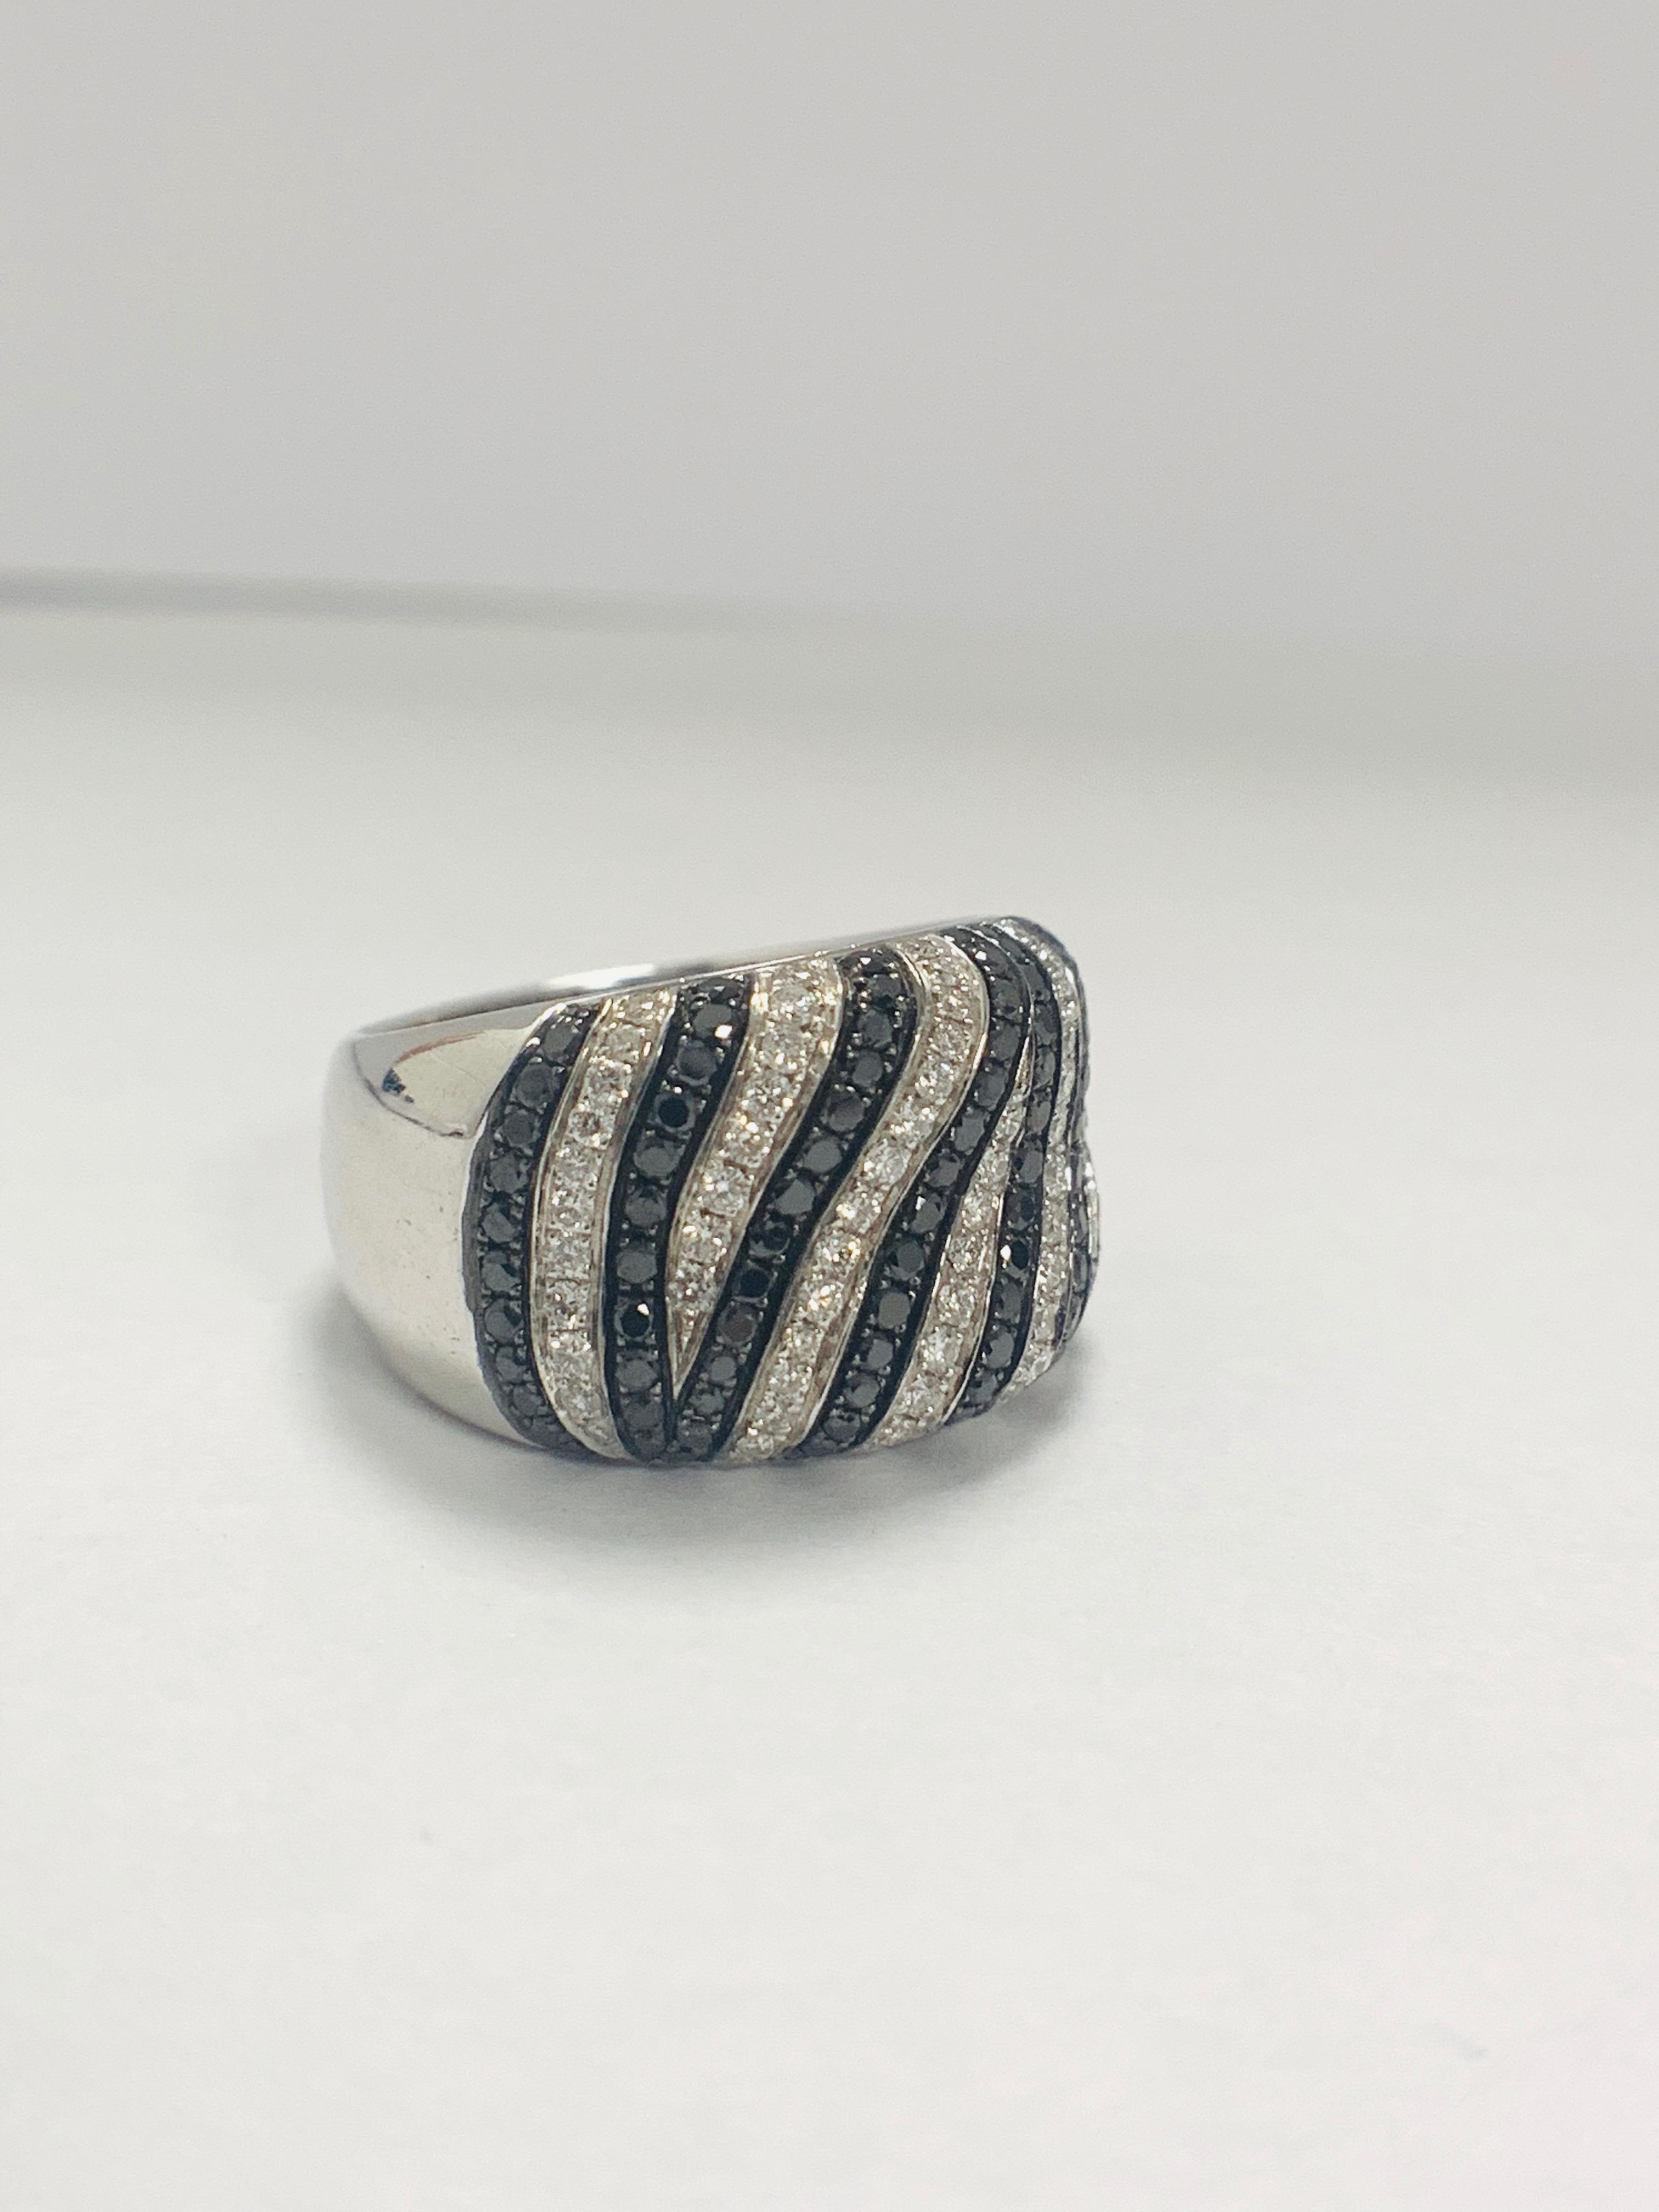 18ct White Gold Diamond ring - Image 8 of 14